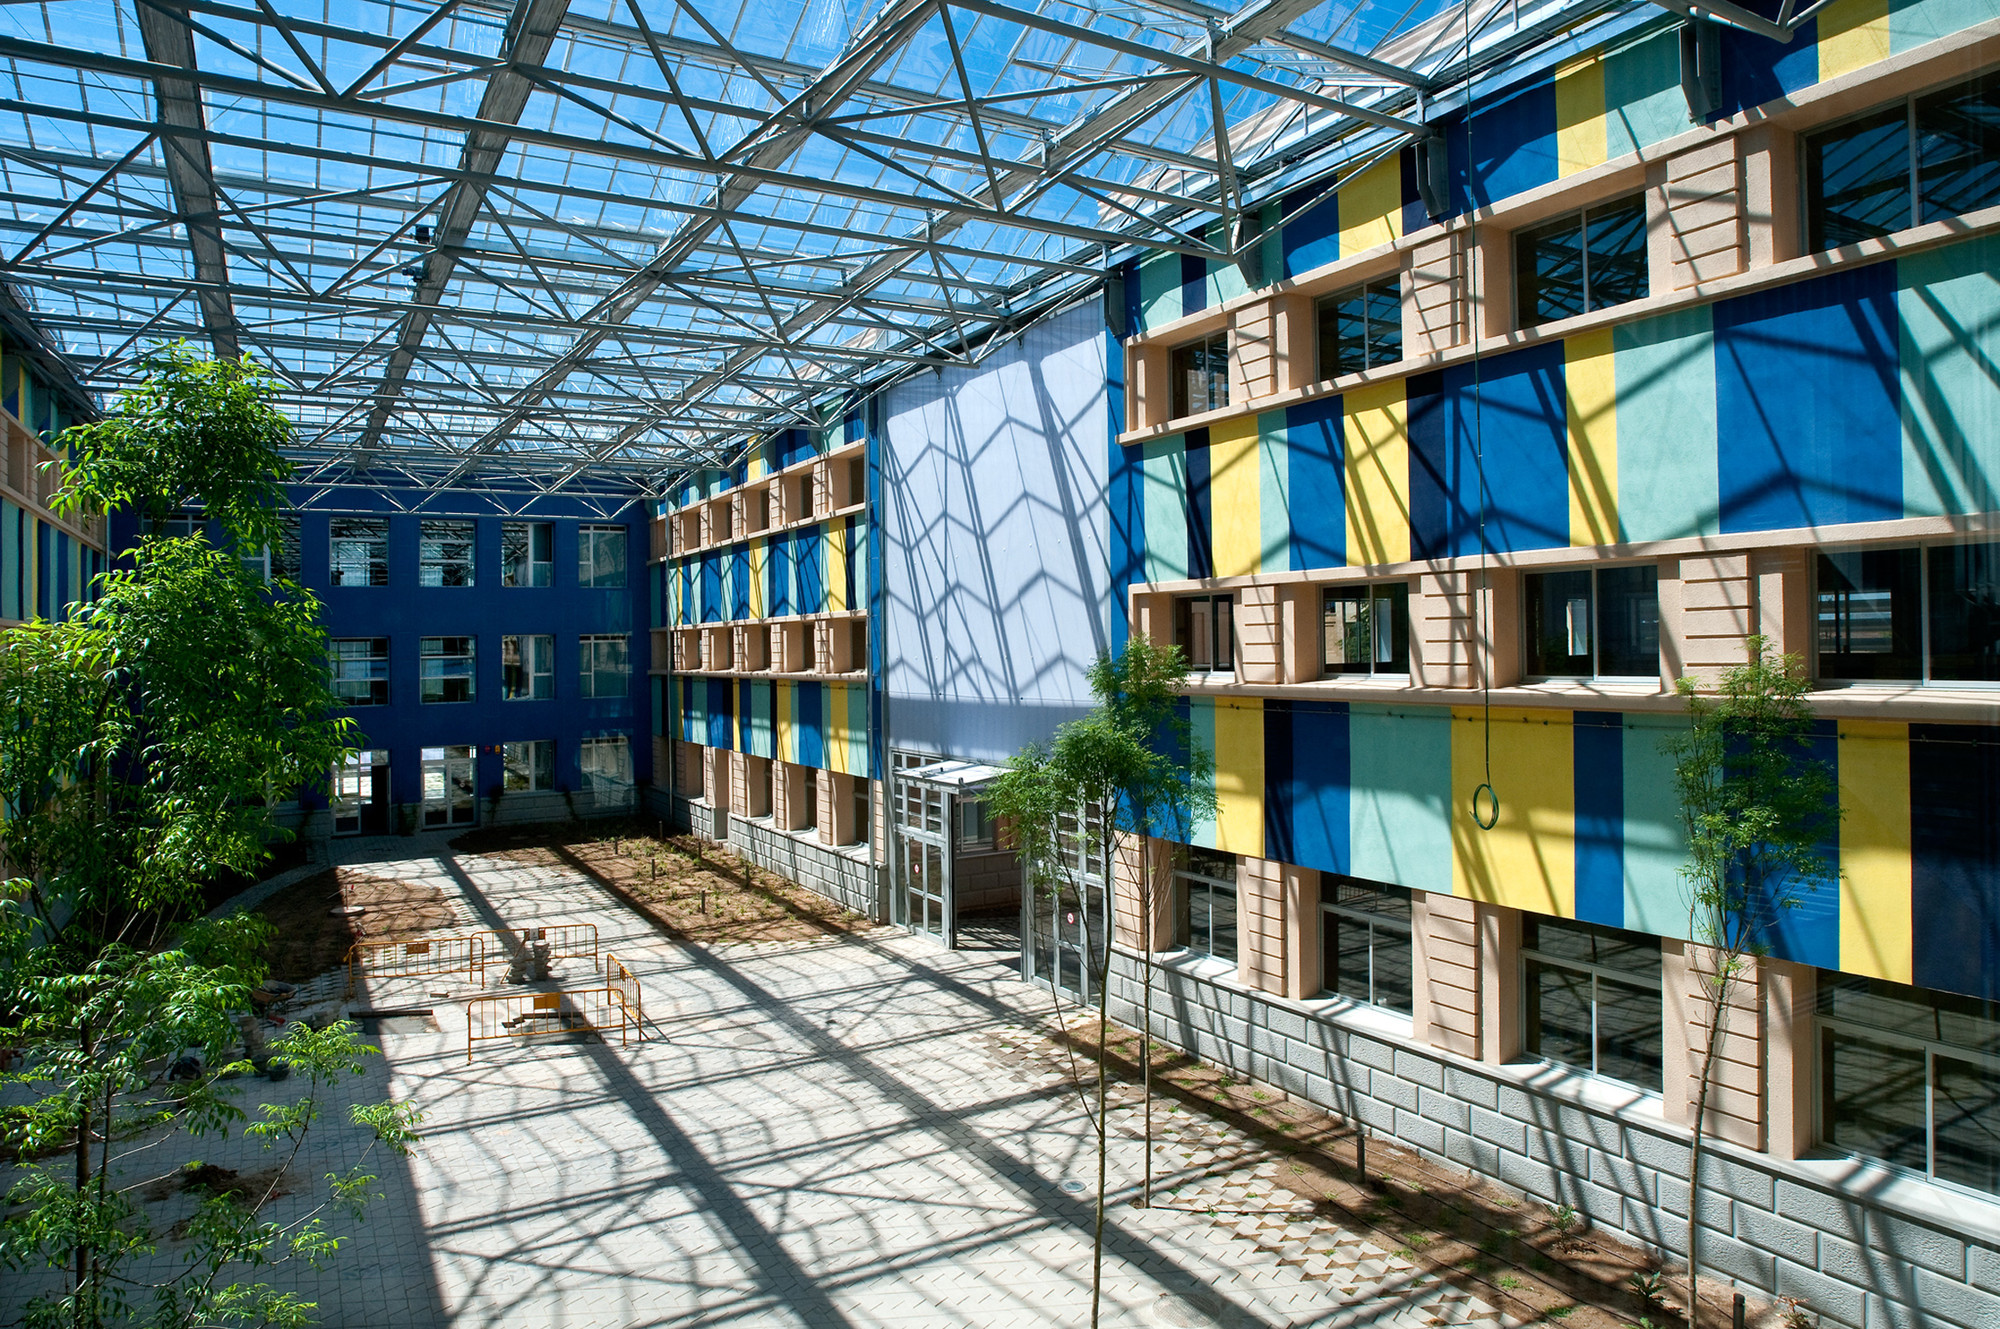 PCITAL GARDENY / Pich-Aguilera Architects, © Jordi V. Pou